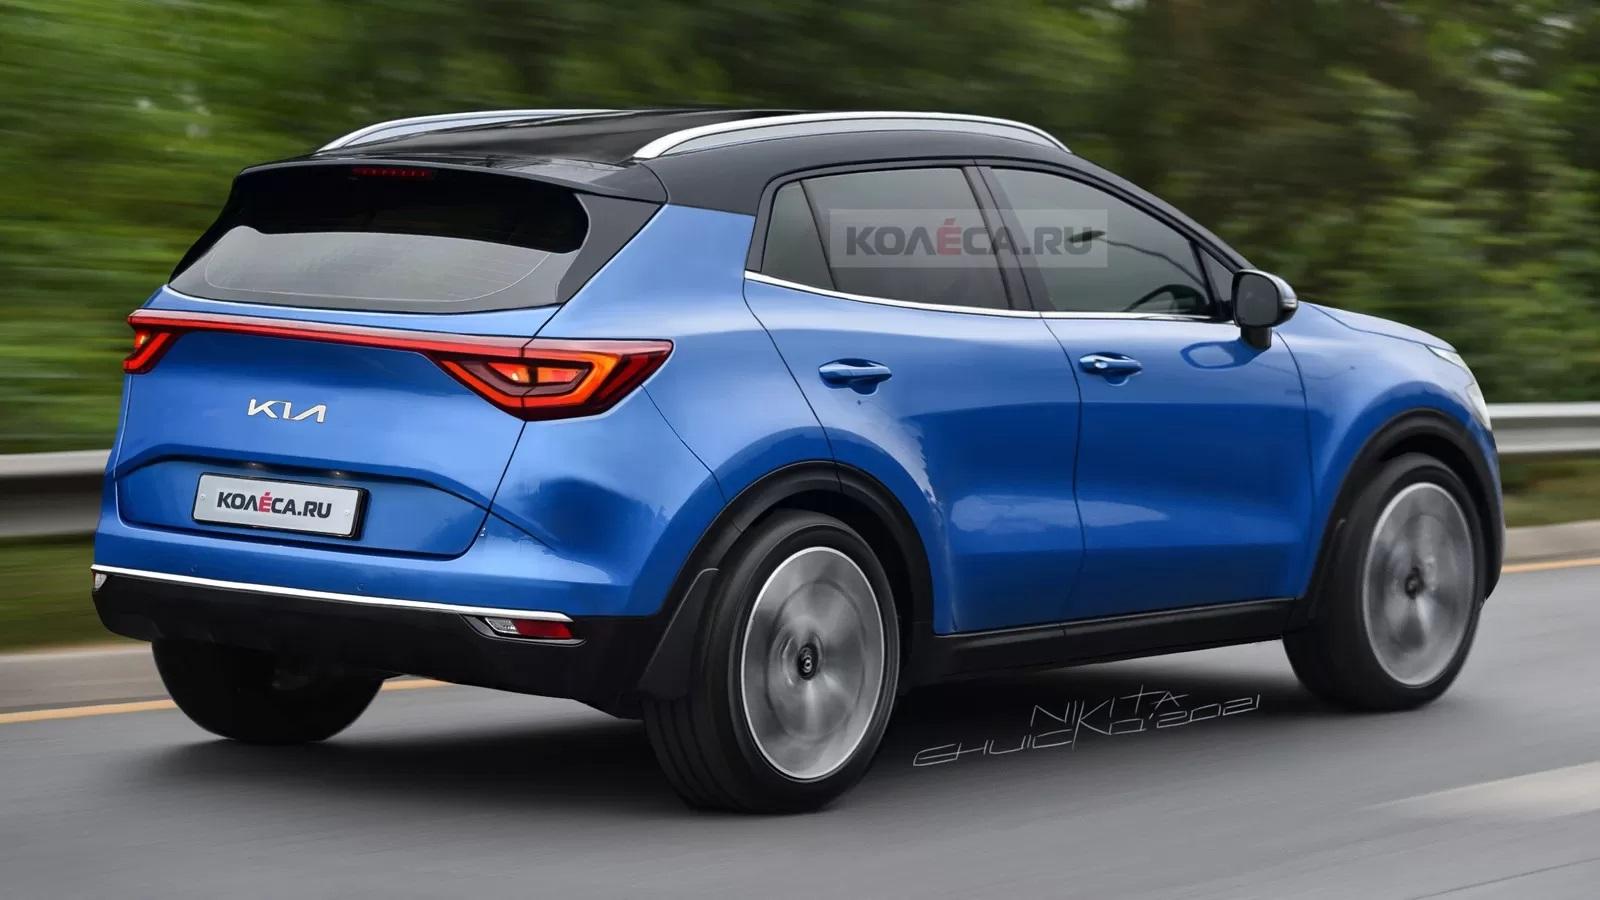 kia-sportage-new-rear2